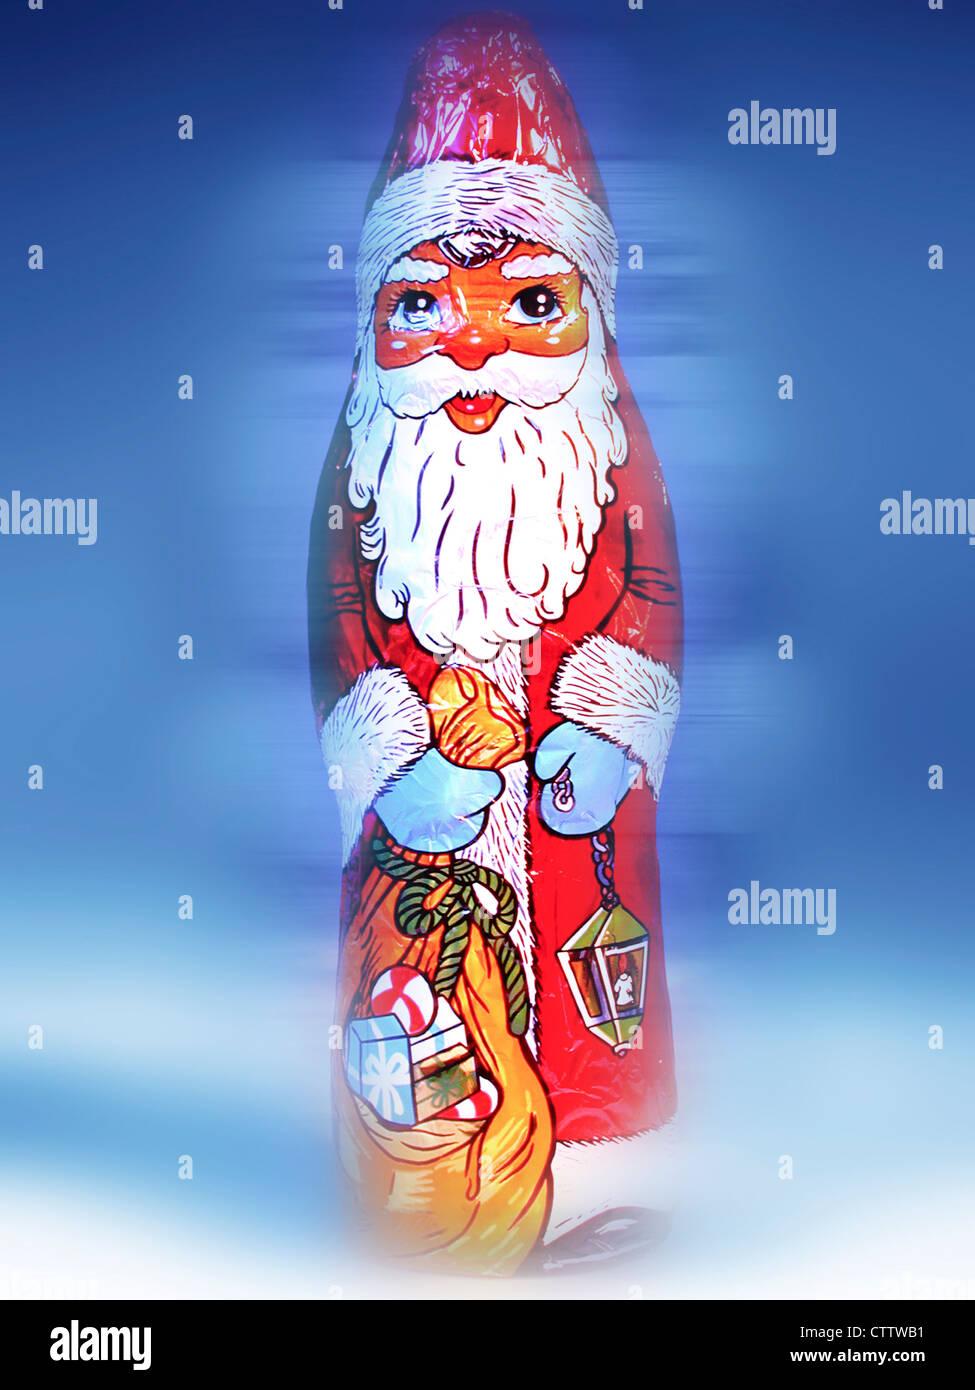 choclate Santa - Schokoladen Nikolaus in Alufolie - Stock Image